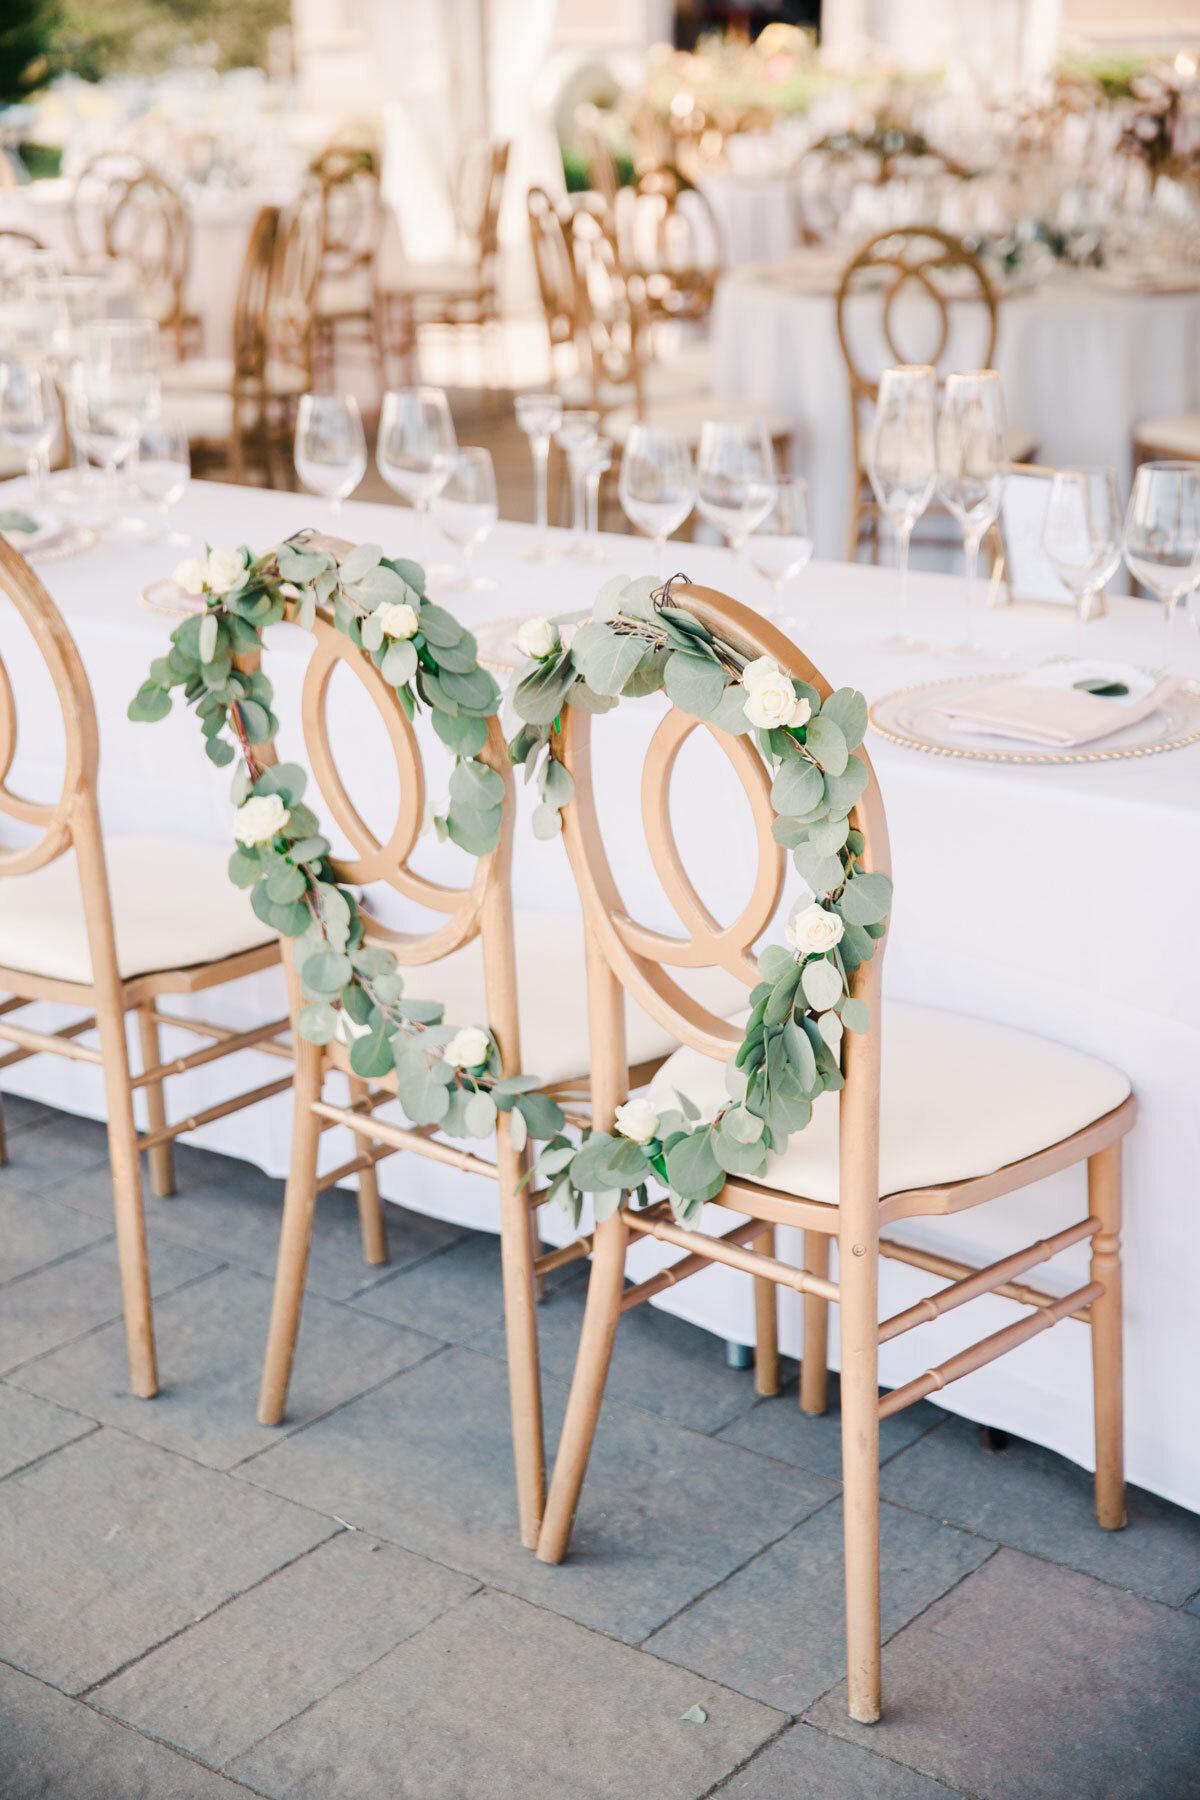 Chateau-des-Charmes-Wedding-Summer-Vineyard-Bride-Niagara-on-the-Lake-photos-by-Gemini-Photography-Ontario-0037.jpg